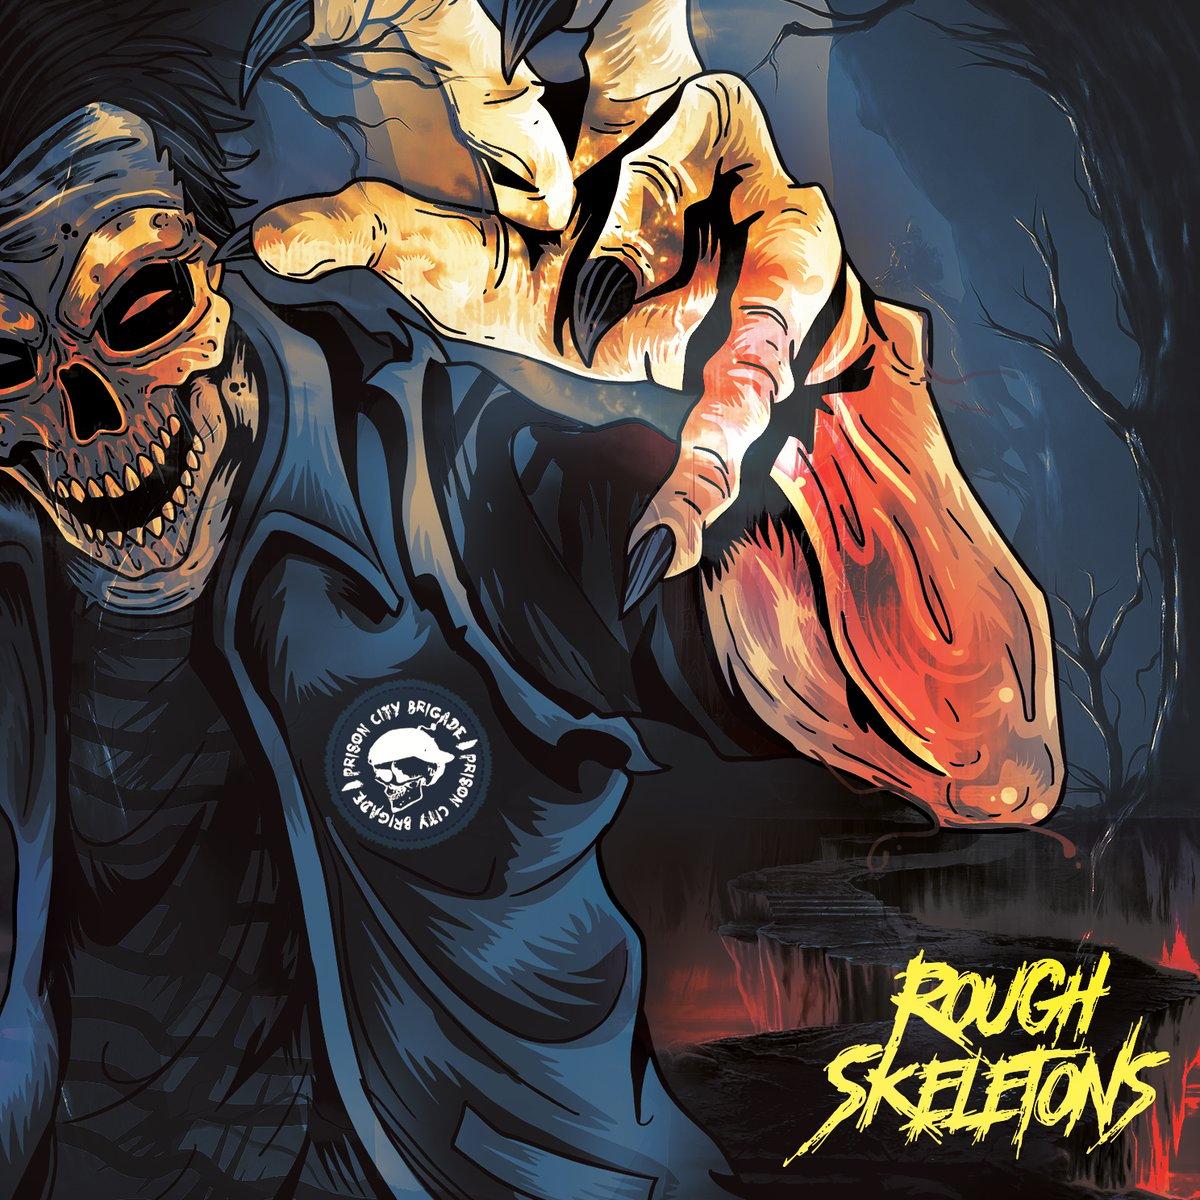 Rough Skeletons CD